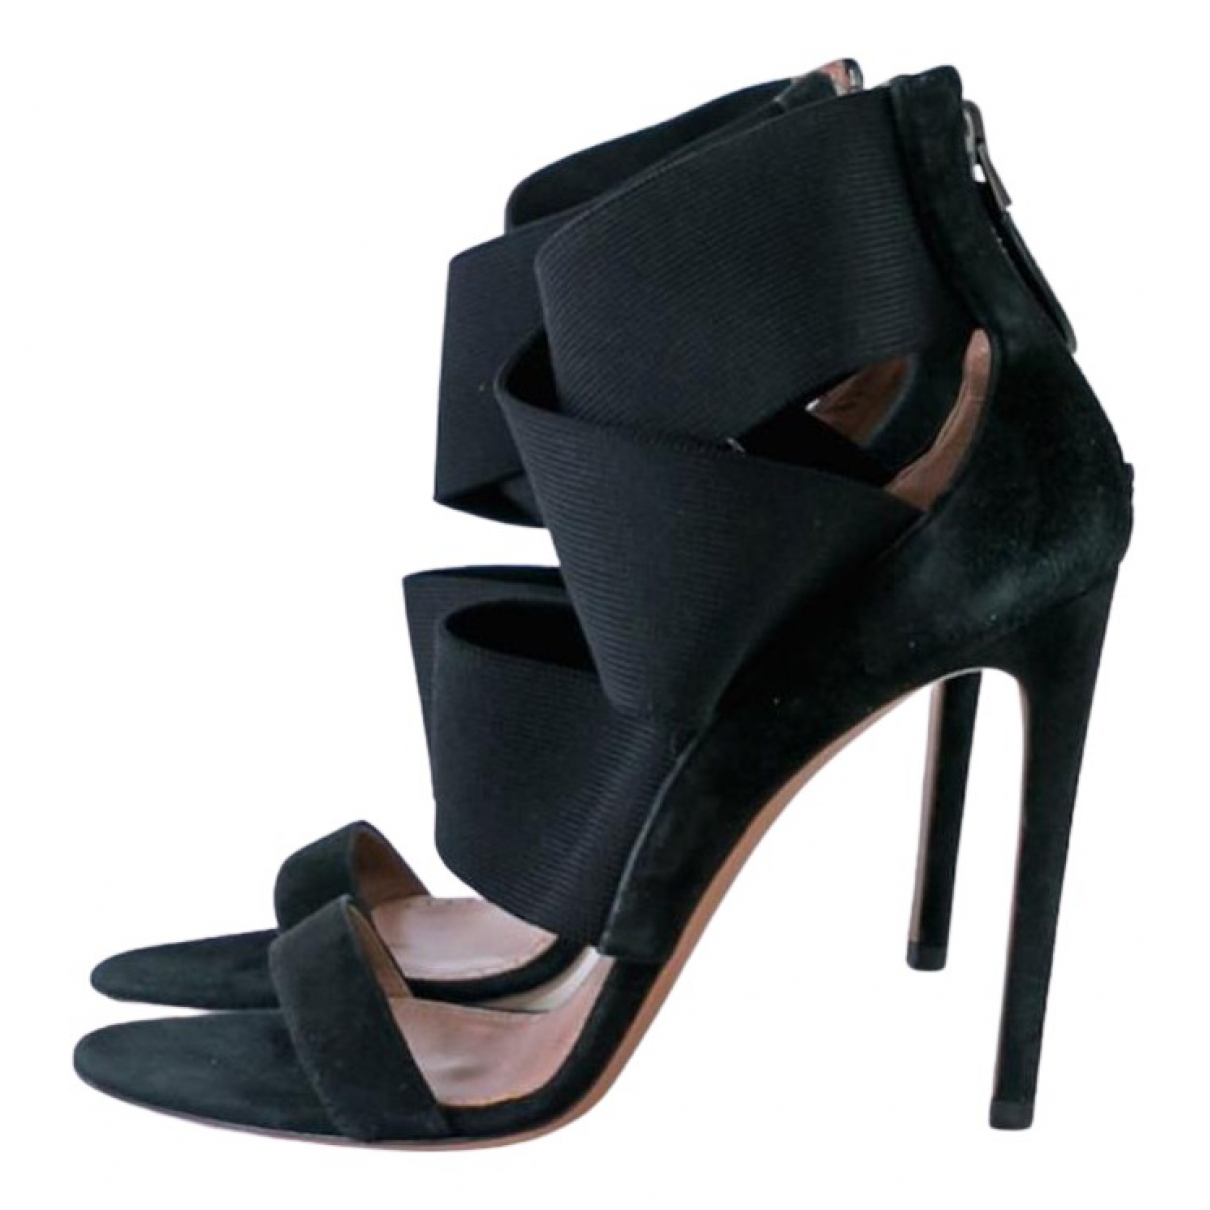 Alaïa N Black Leather Sandals for Women 38.5 EU